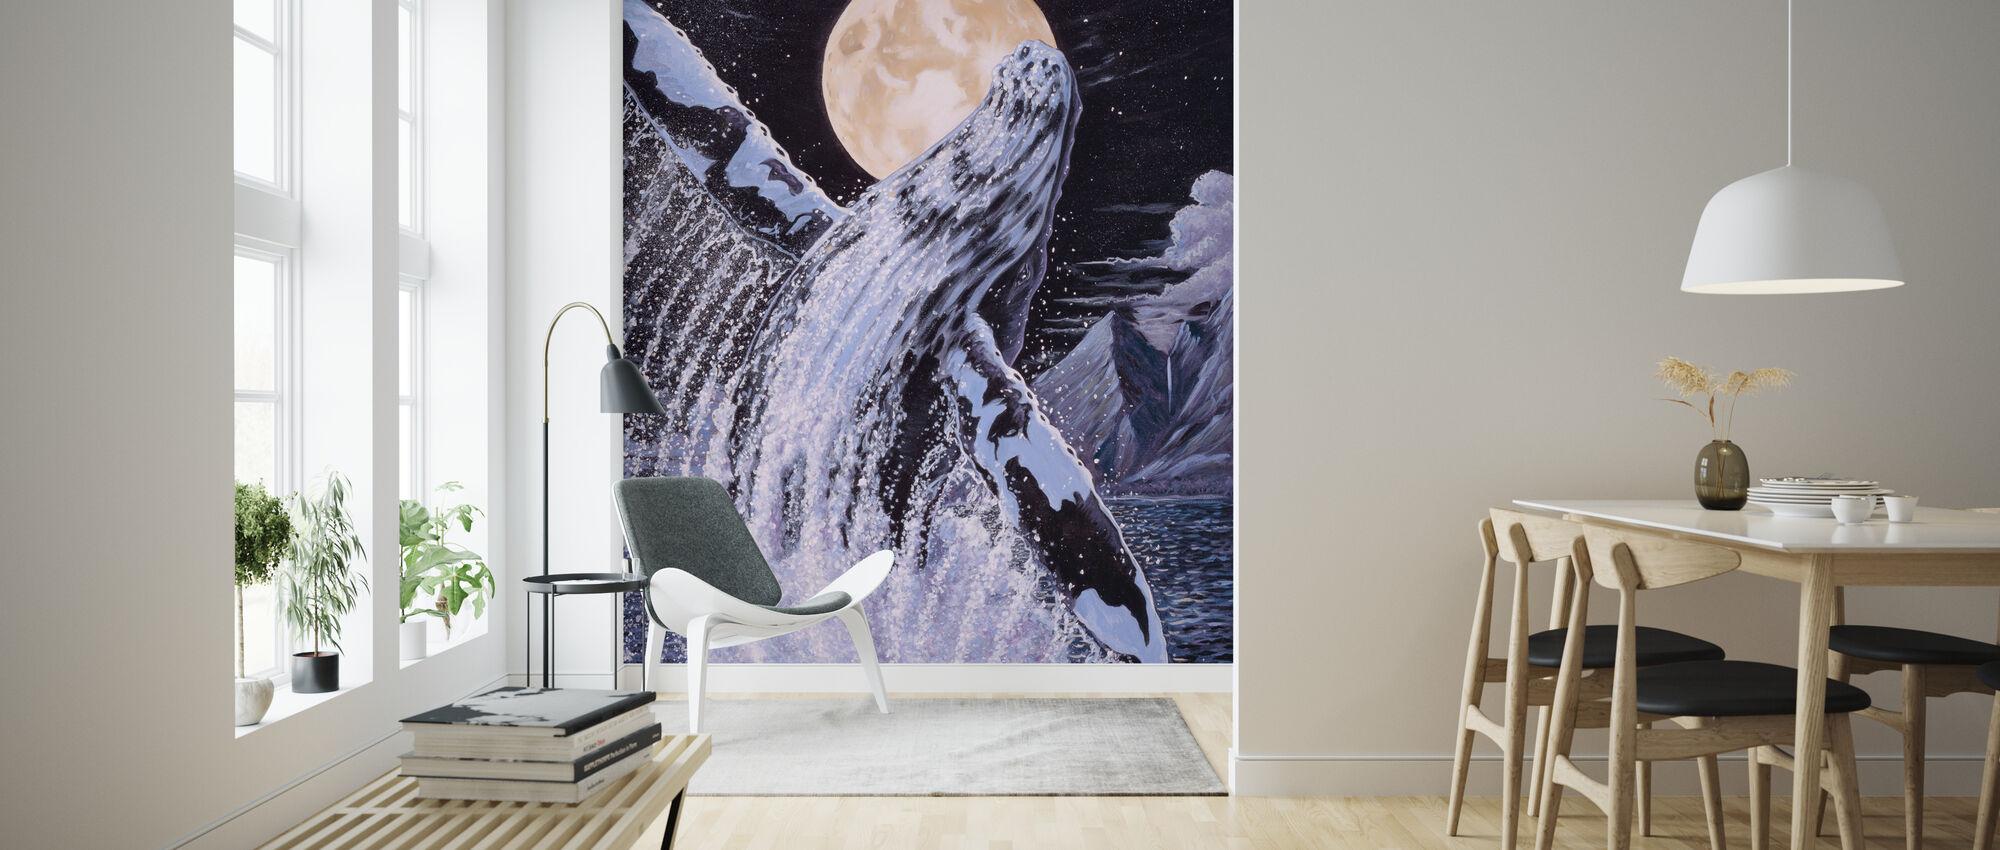 Moondance - Wallpaper - Living Room